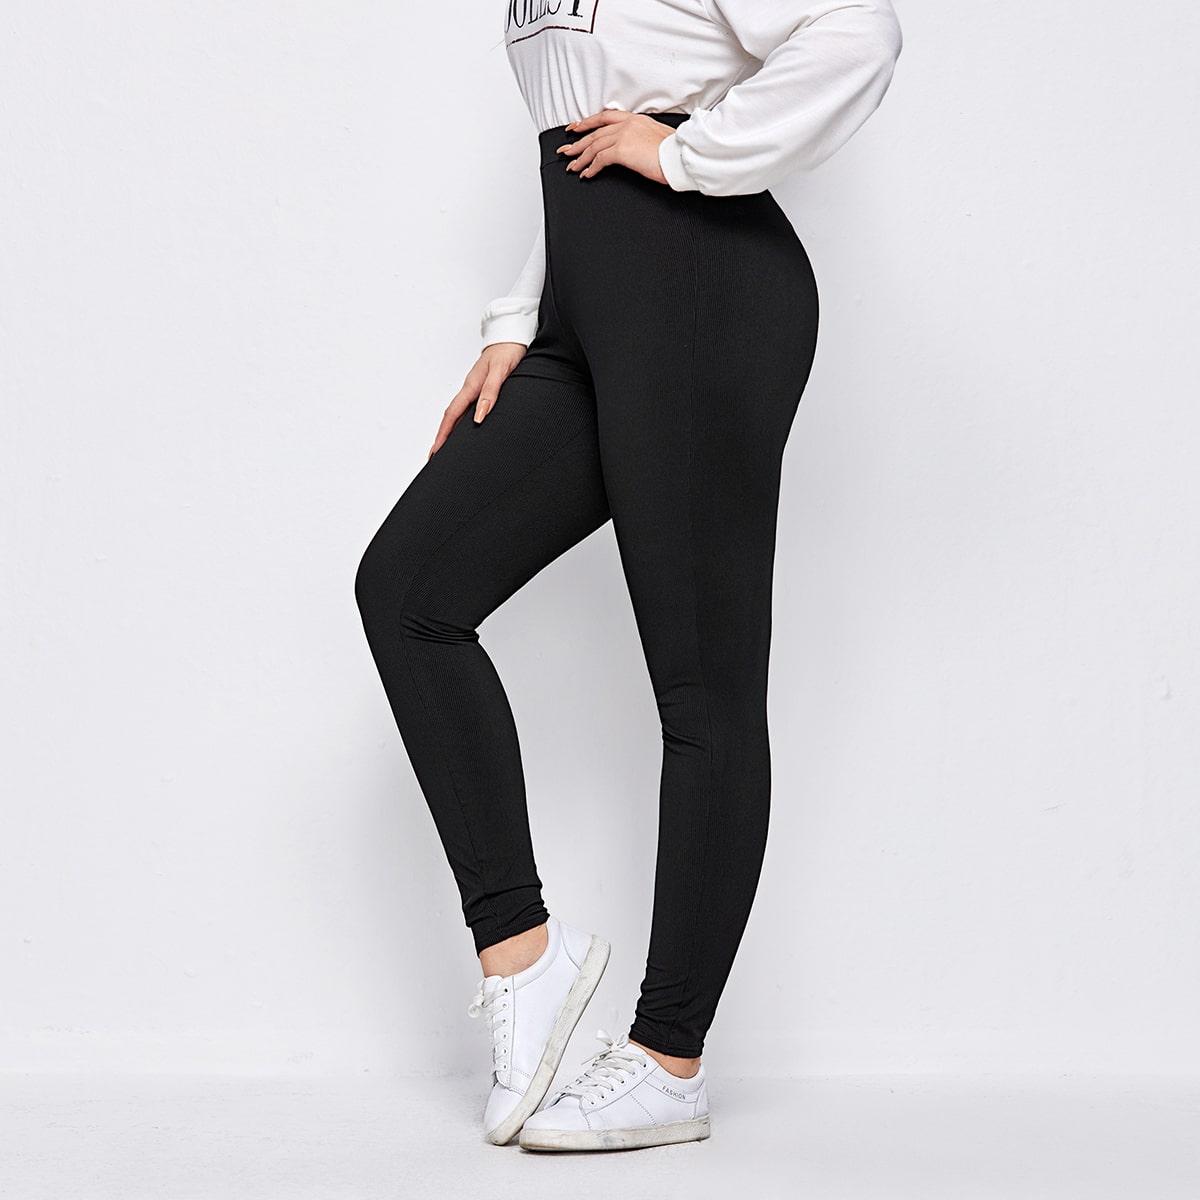 SHEIN / Rippenstrick Leggings mit hoher Taille